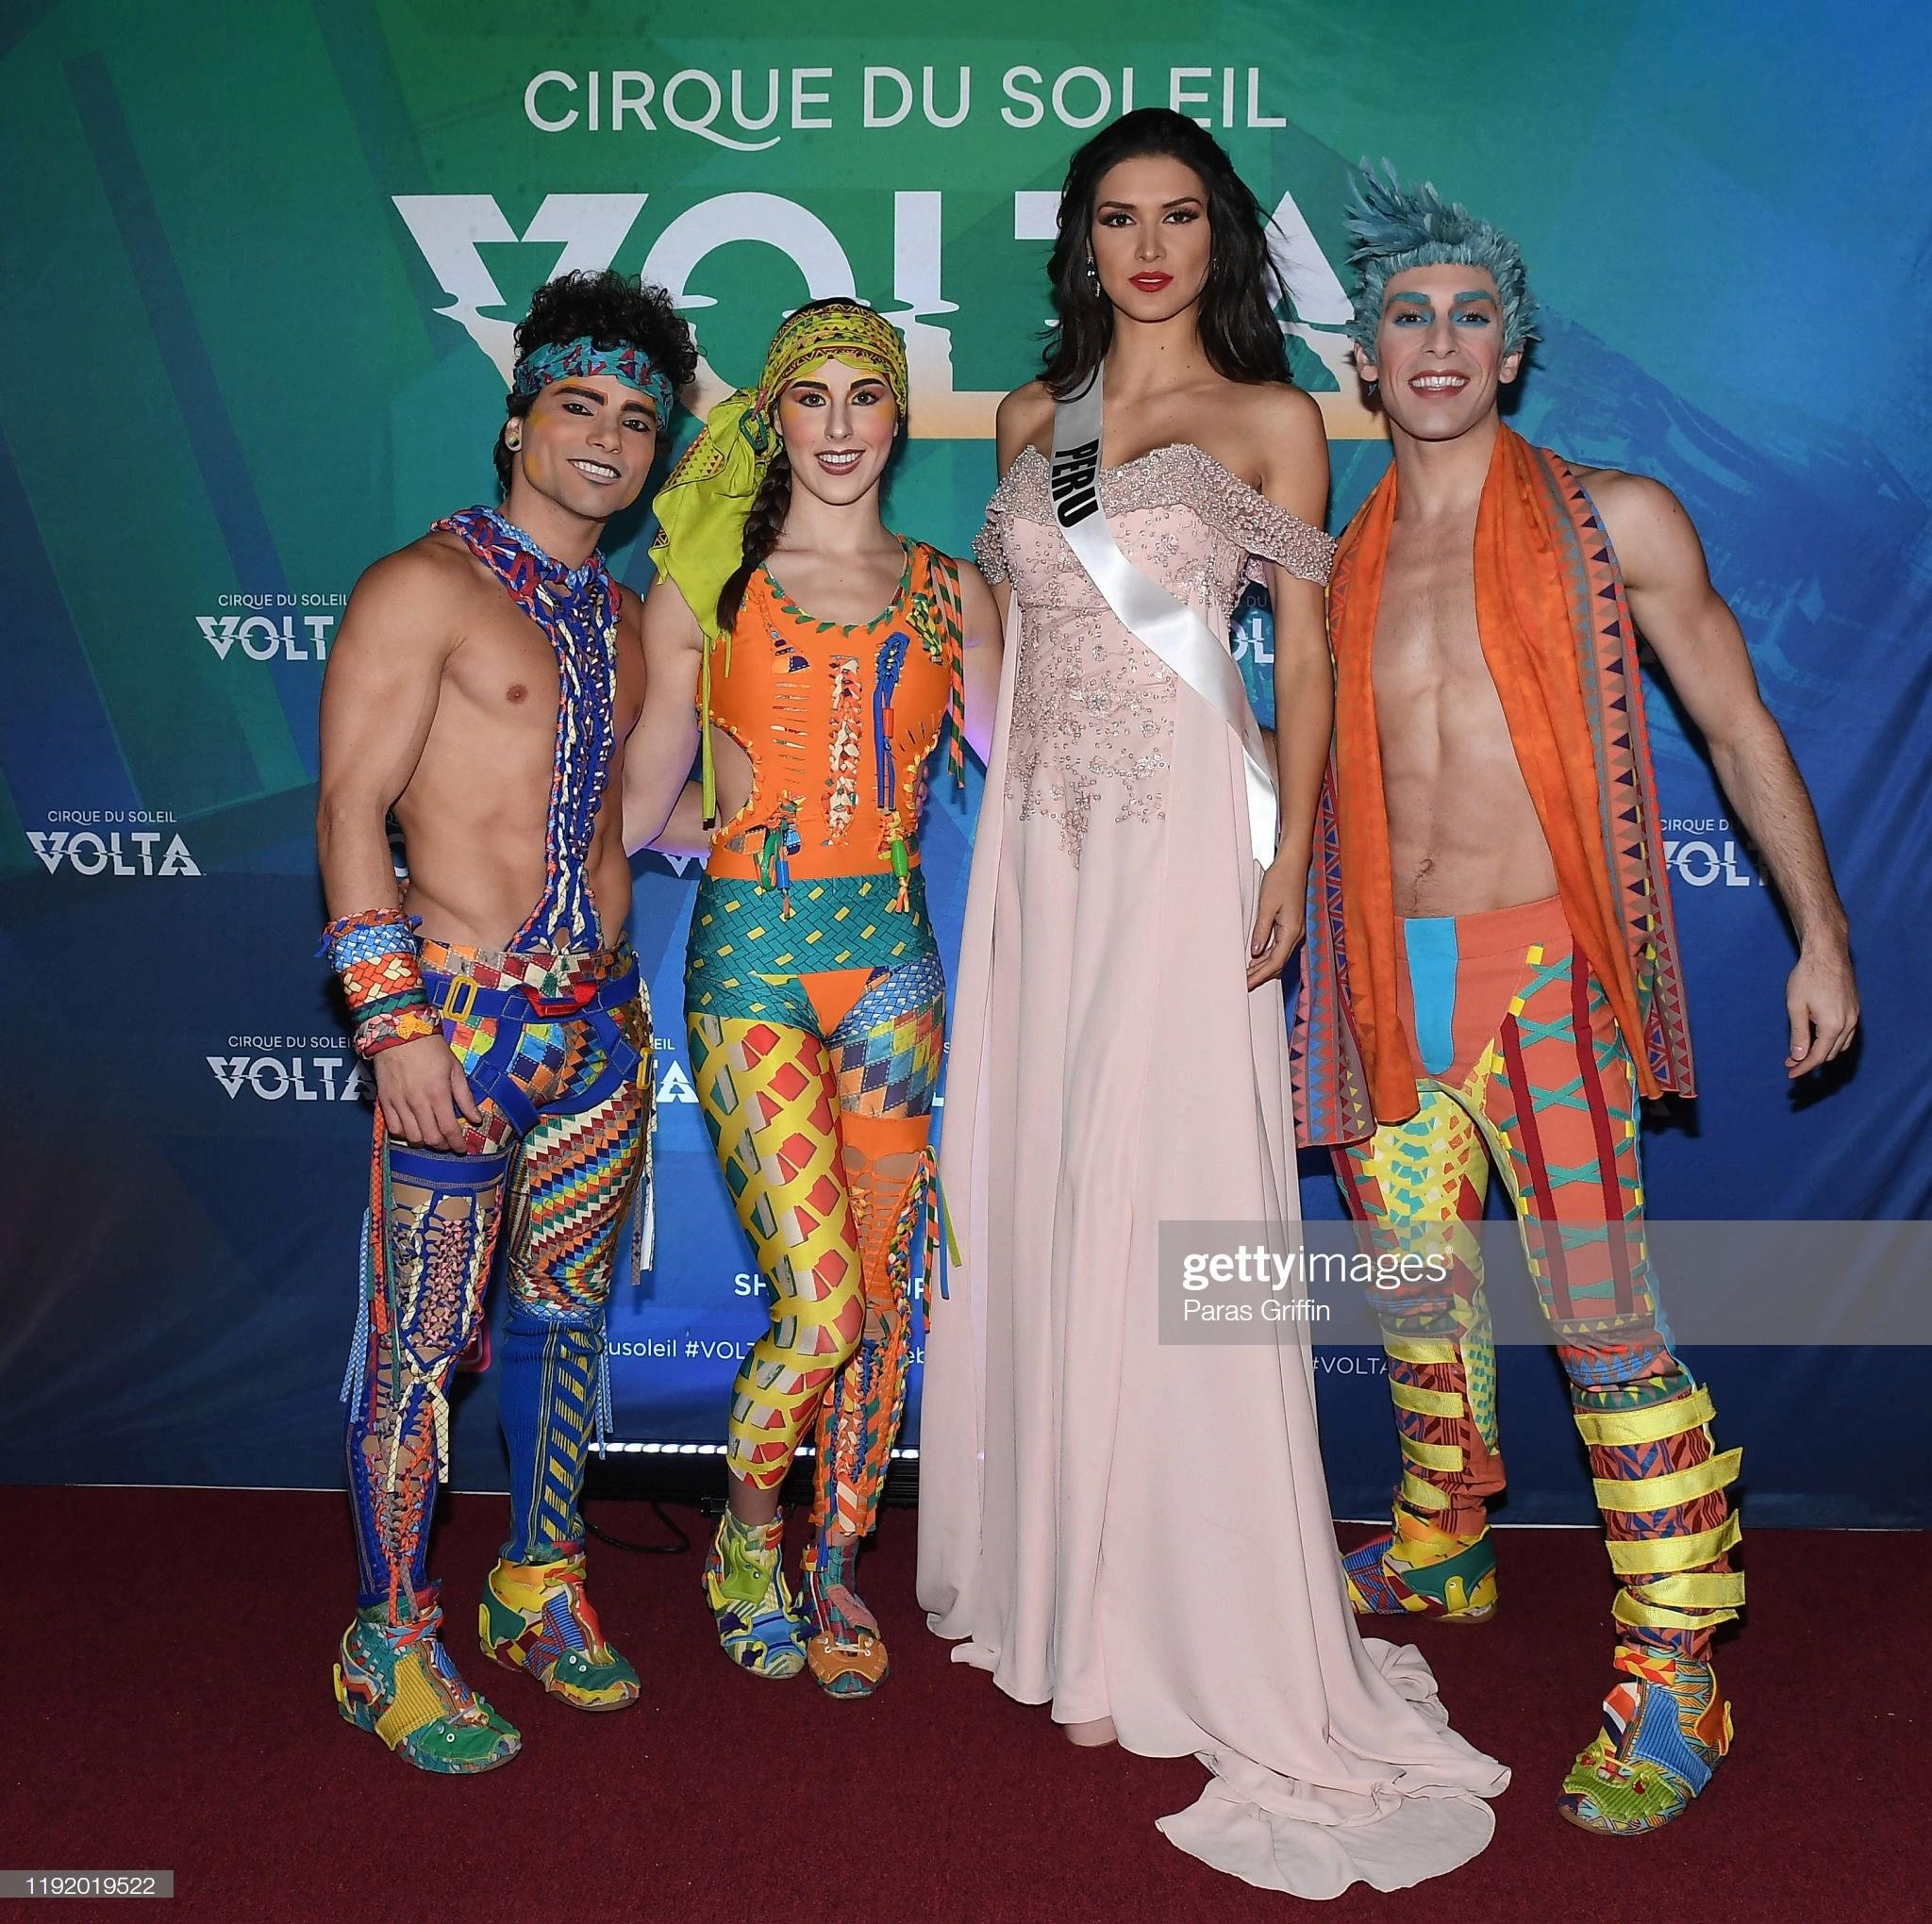 kelin rivera kroll, top 10 de miss universe 2019/2nd runner-up de miss eco international 2018/world miss university 2016. - Página 18 Miss-p24